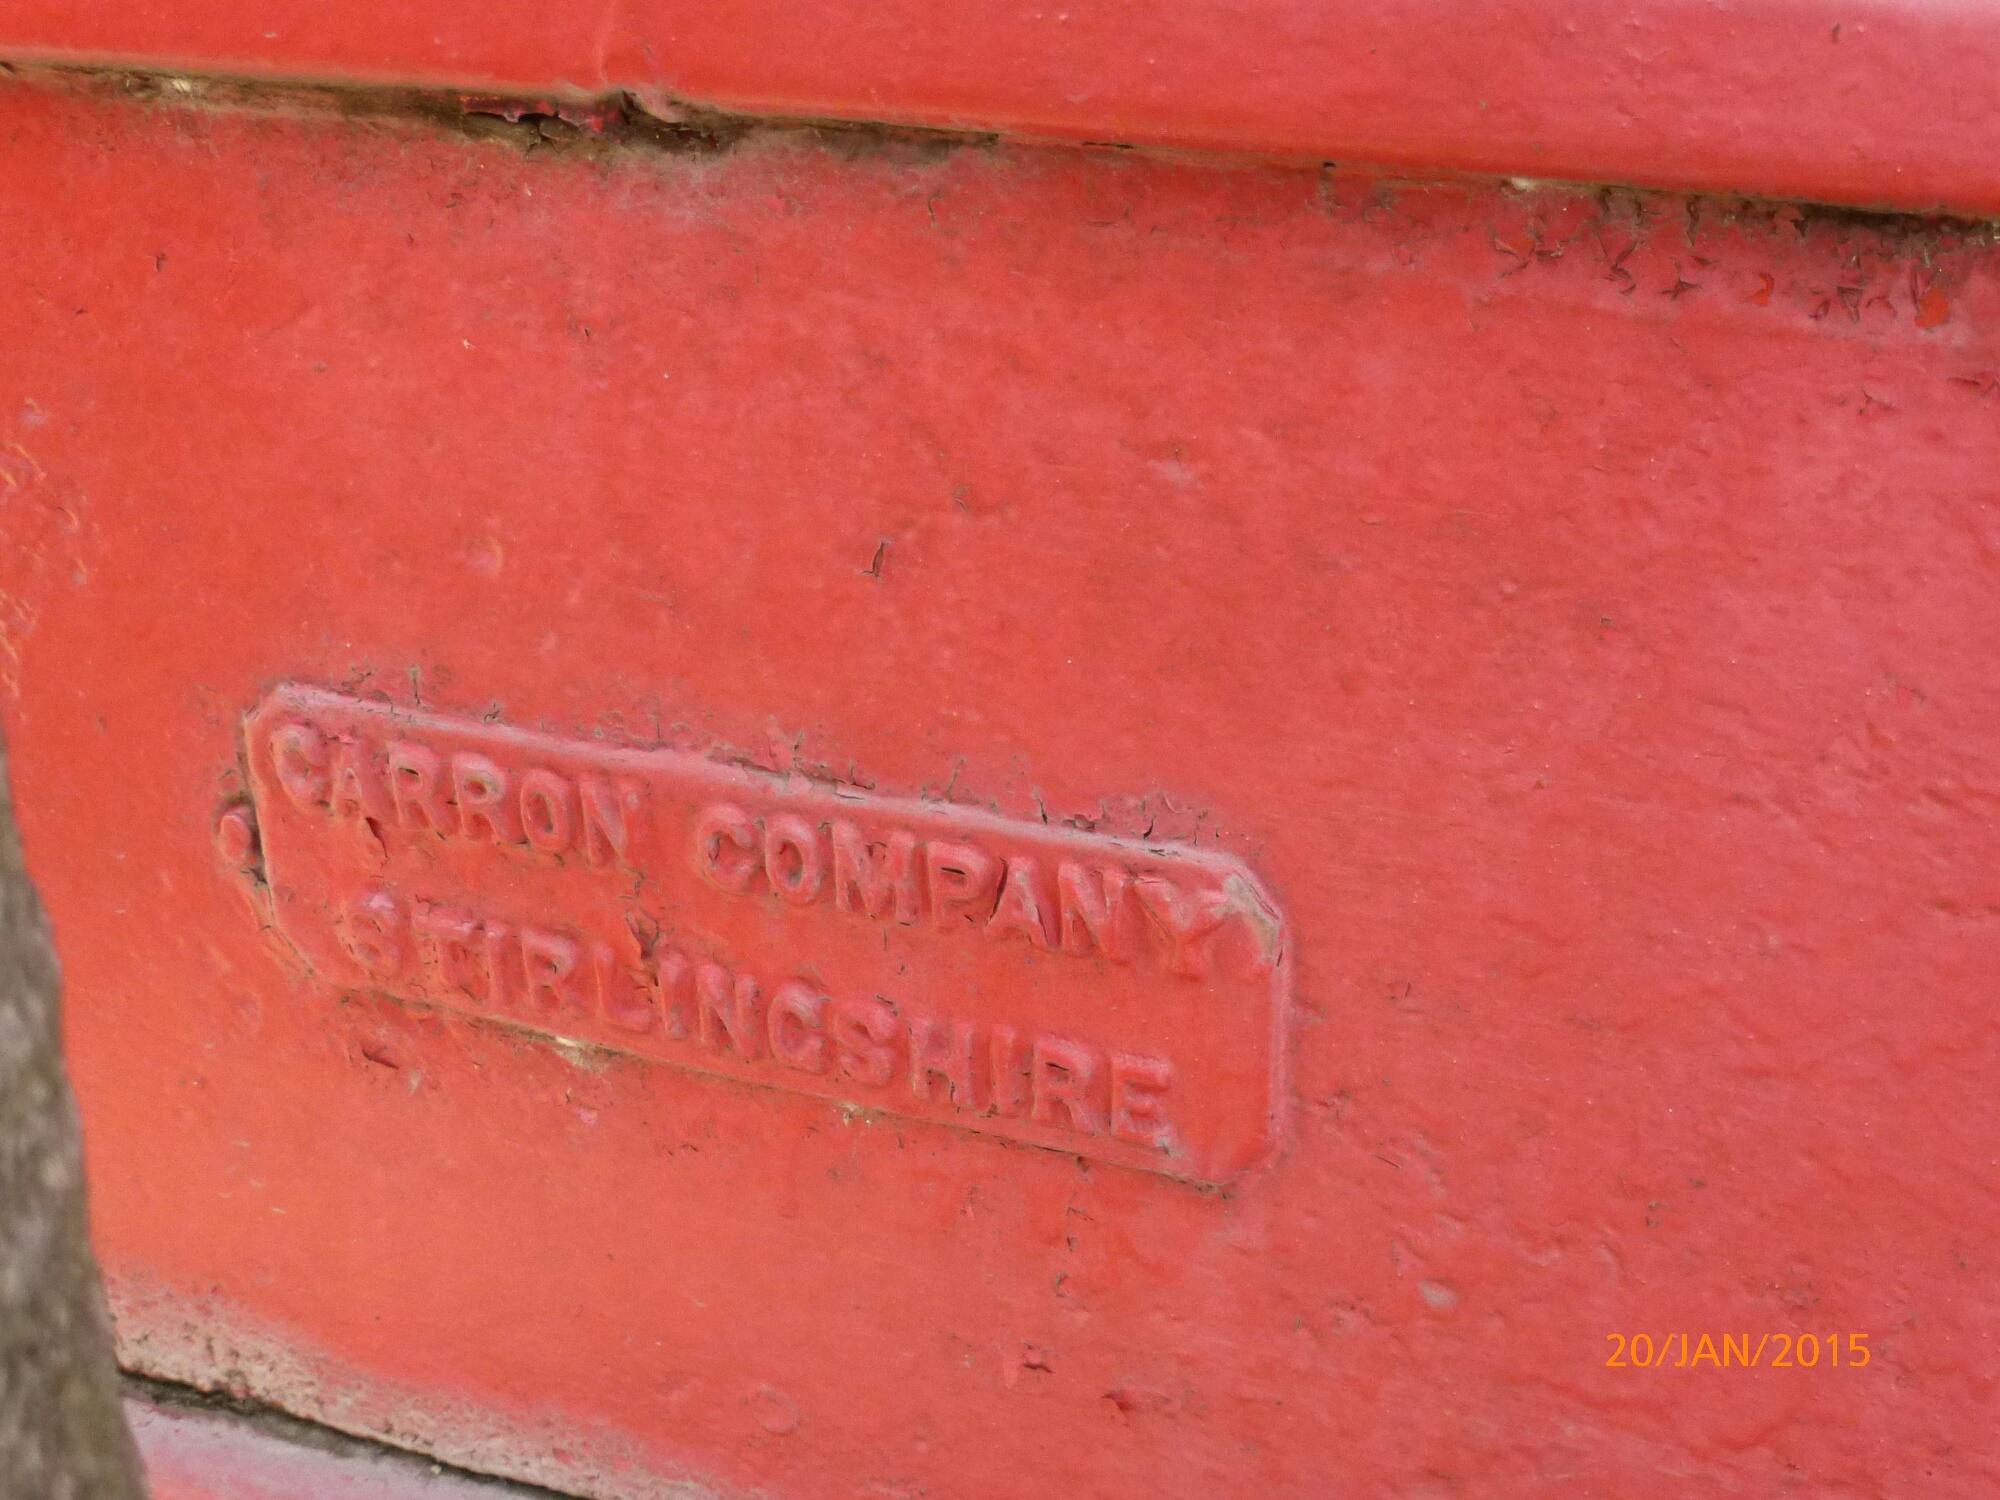 Carron Telephone Kiosk, Panama Canal